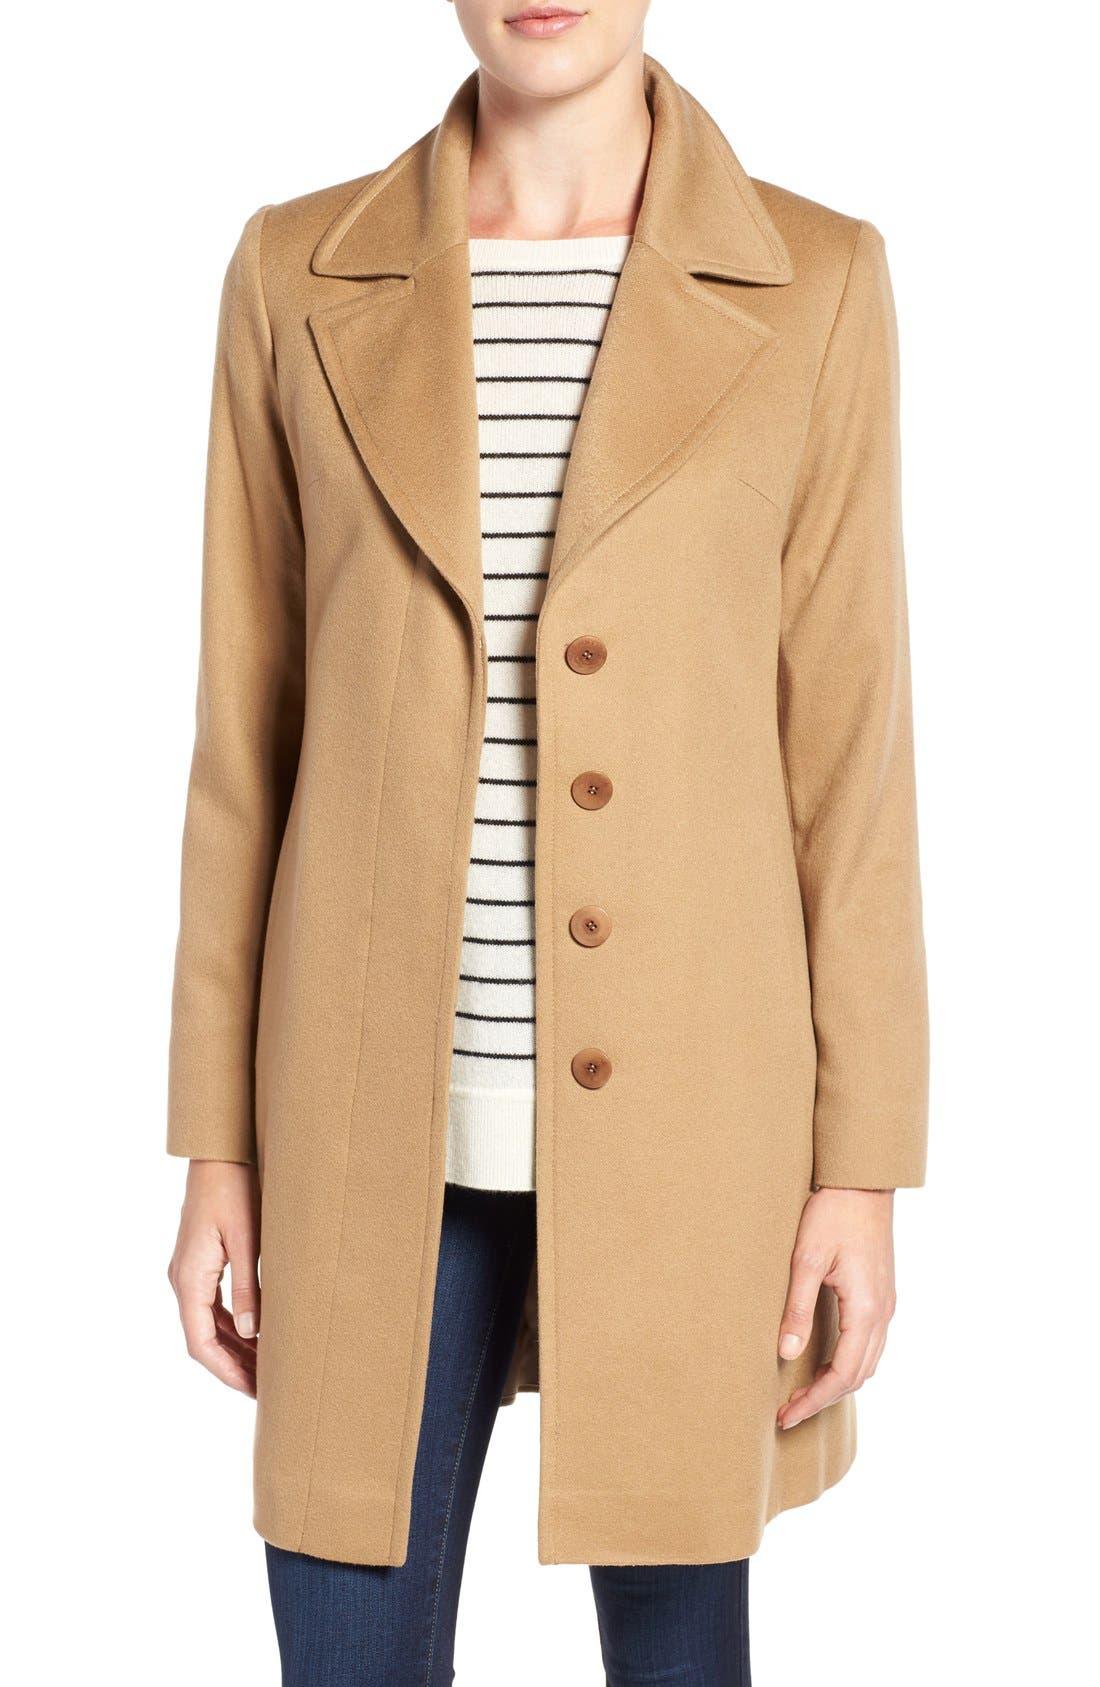 Alternate Image 1 Selected - Fleurette Notch Collar Lightweight Cashmere Coat